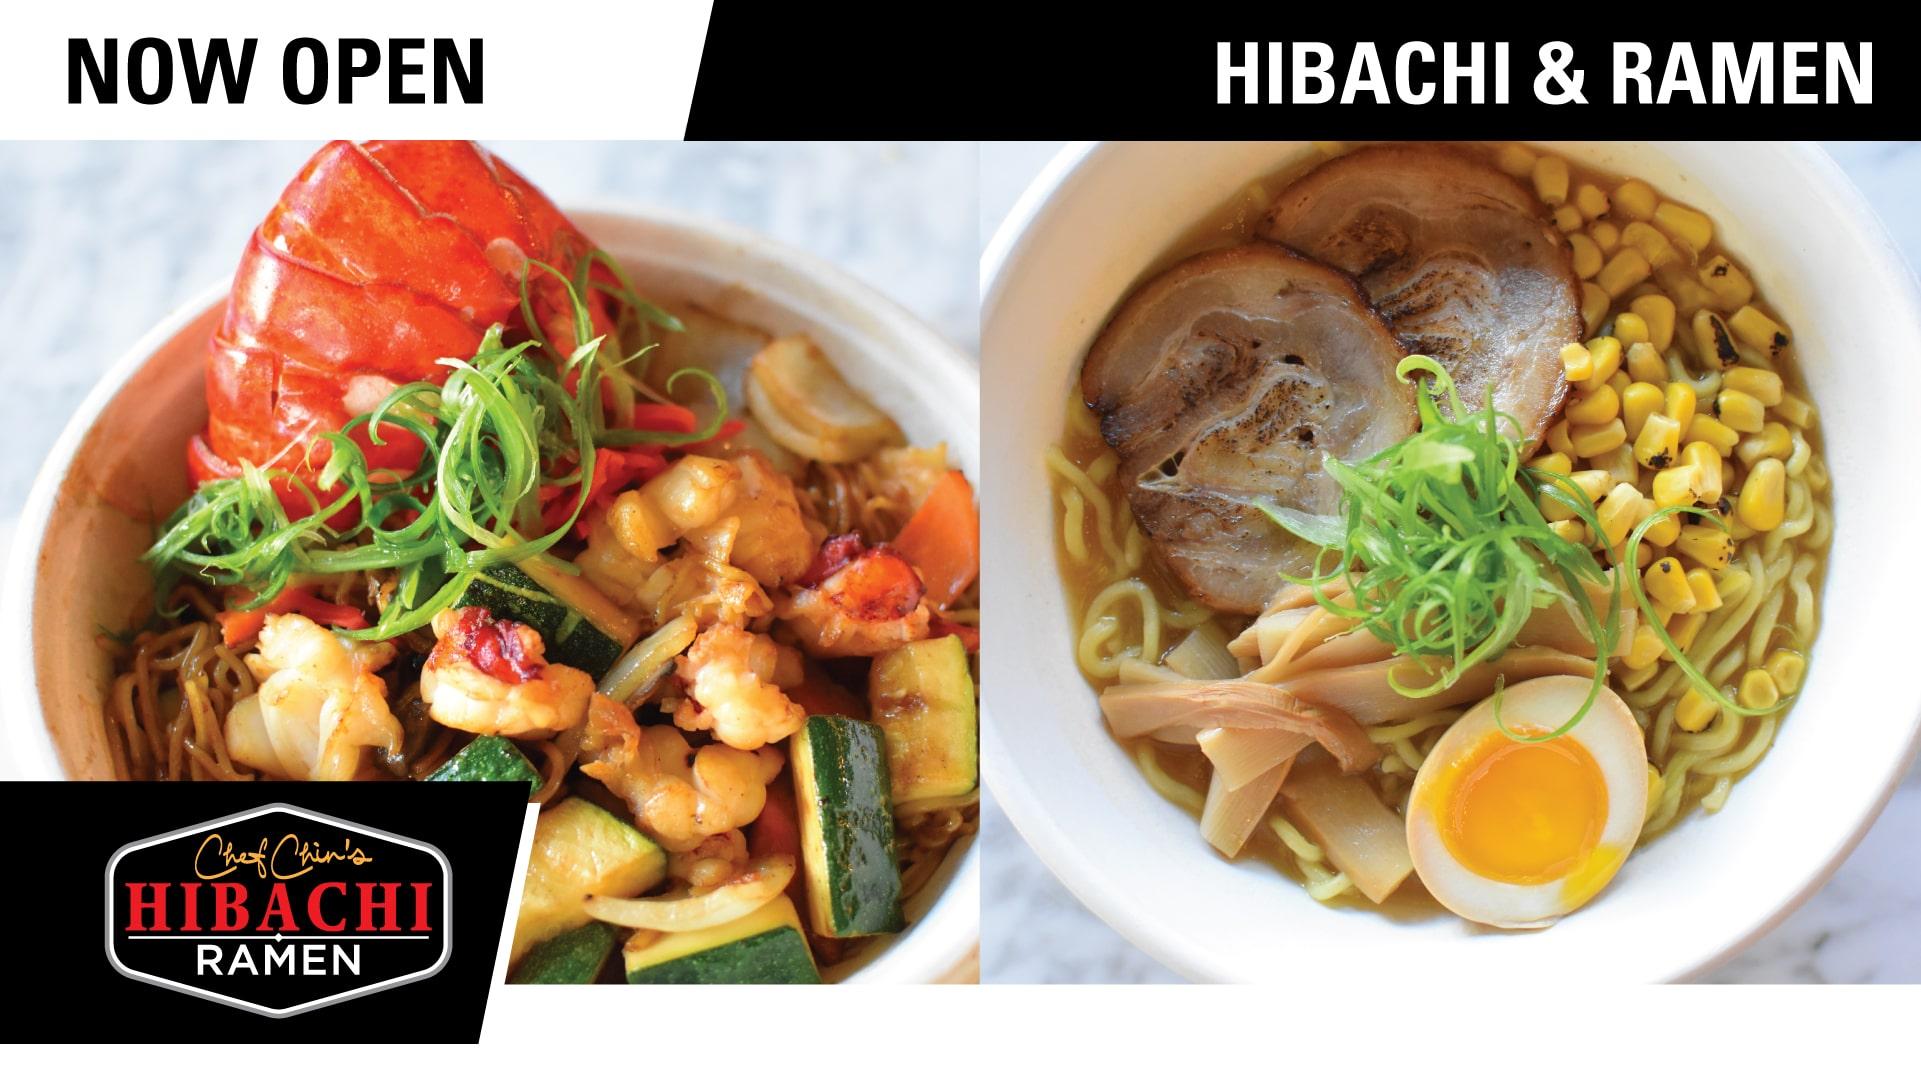 Hibachi & Ramen